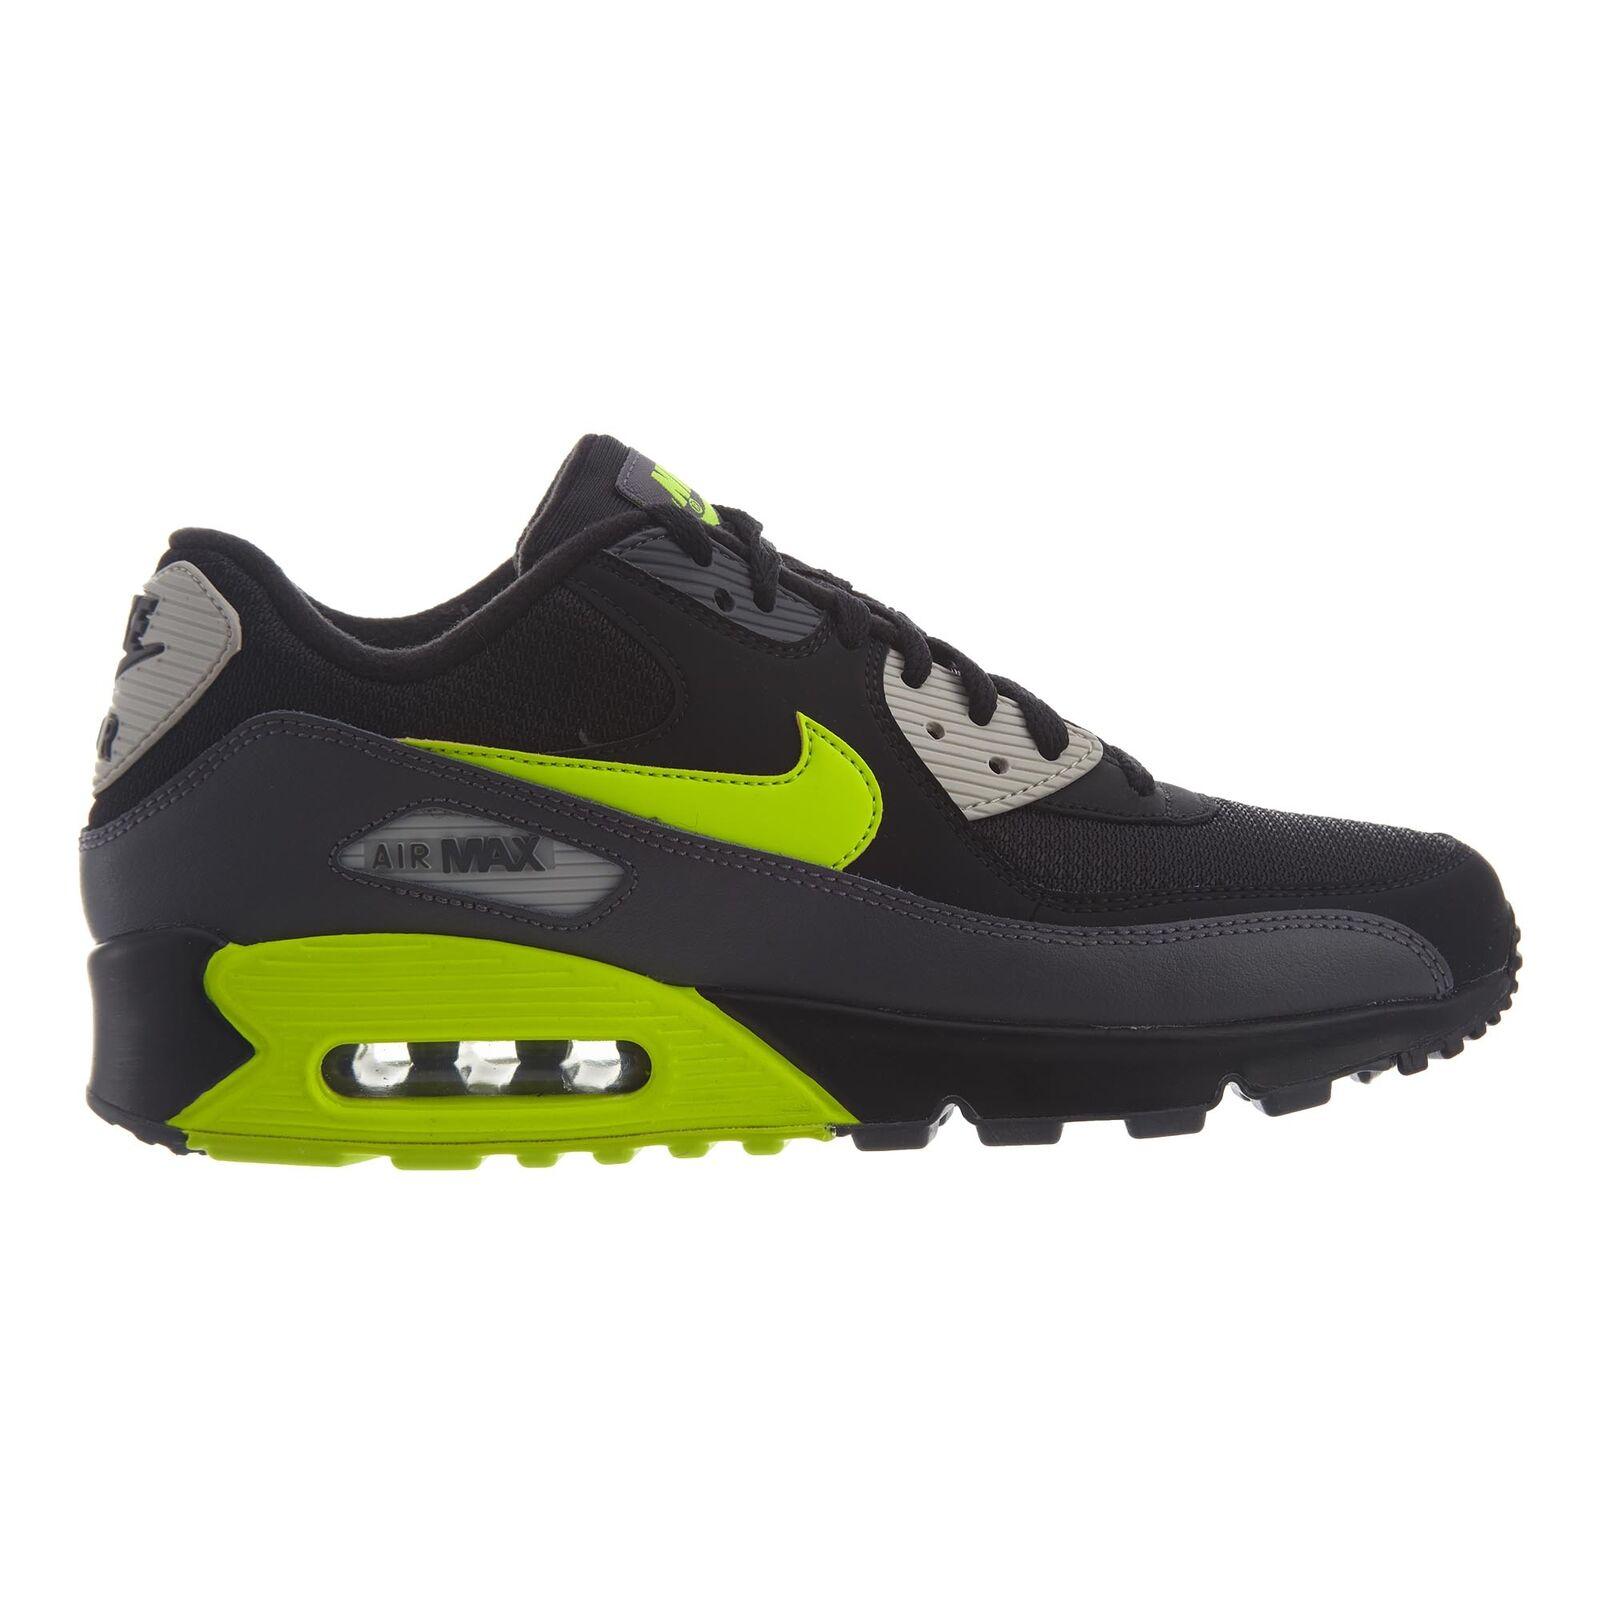 Nike air max 90 essenziale Uomo aj1285-015 volt neri volt aj1285-015 scarpe taglia 7,5 56b2bd